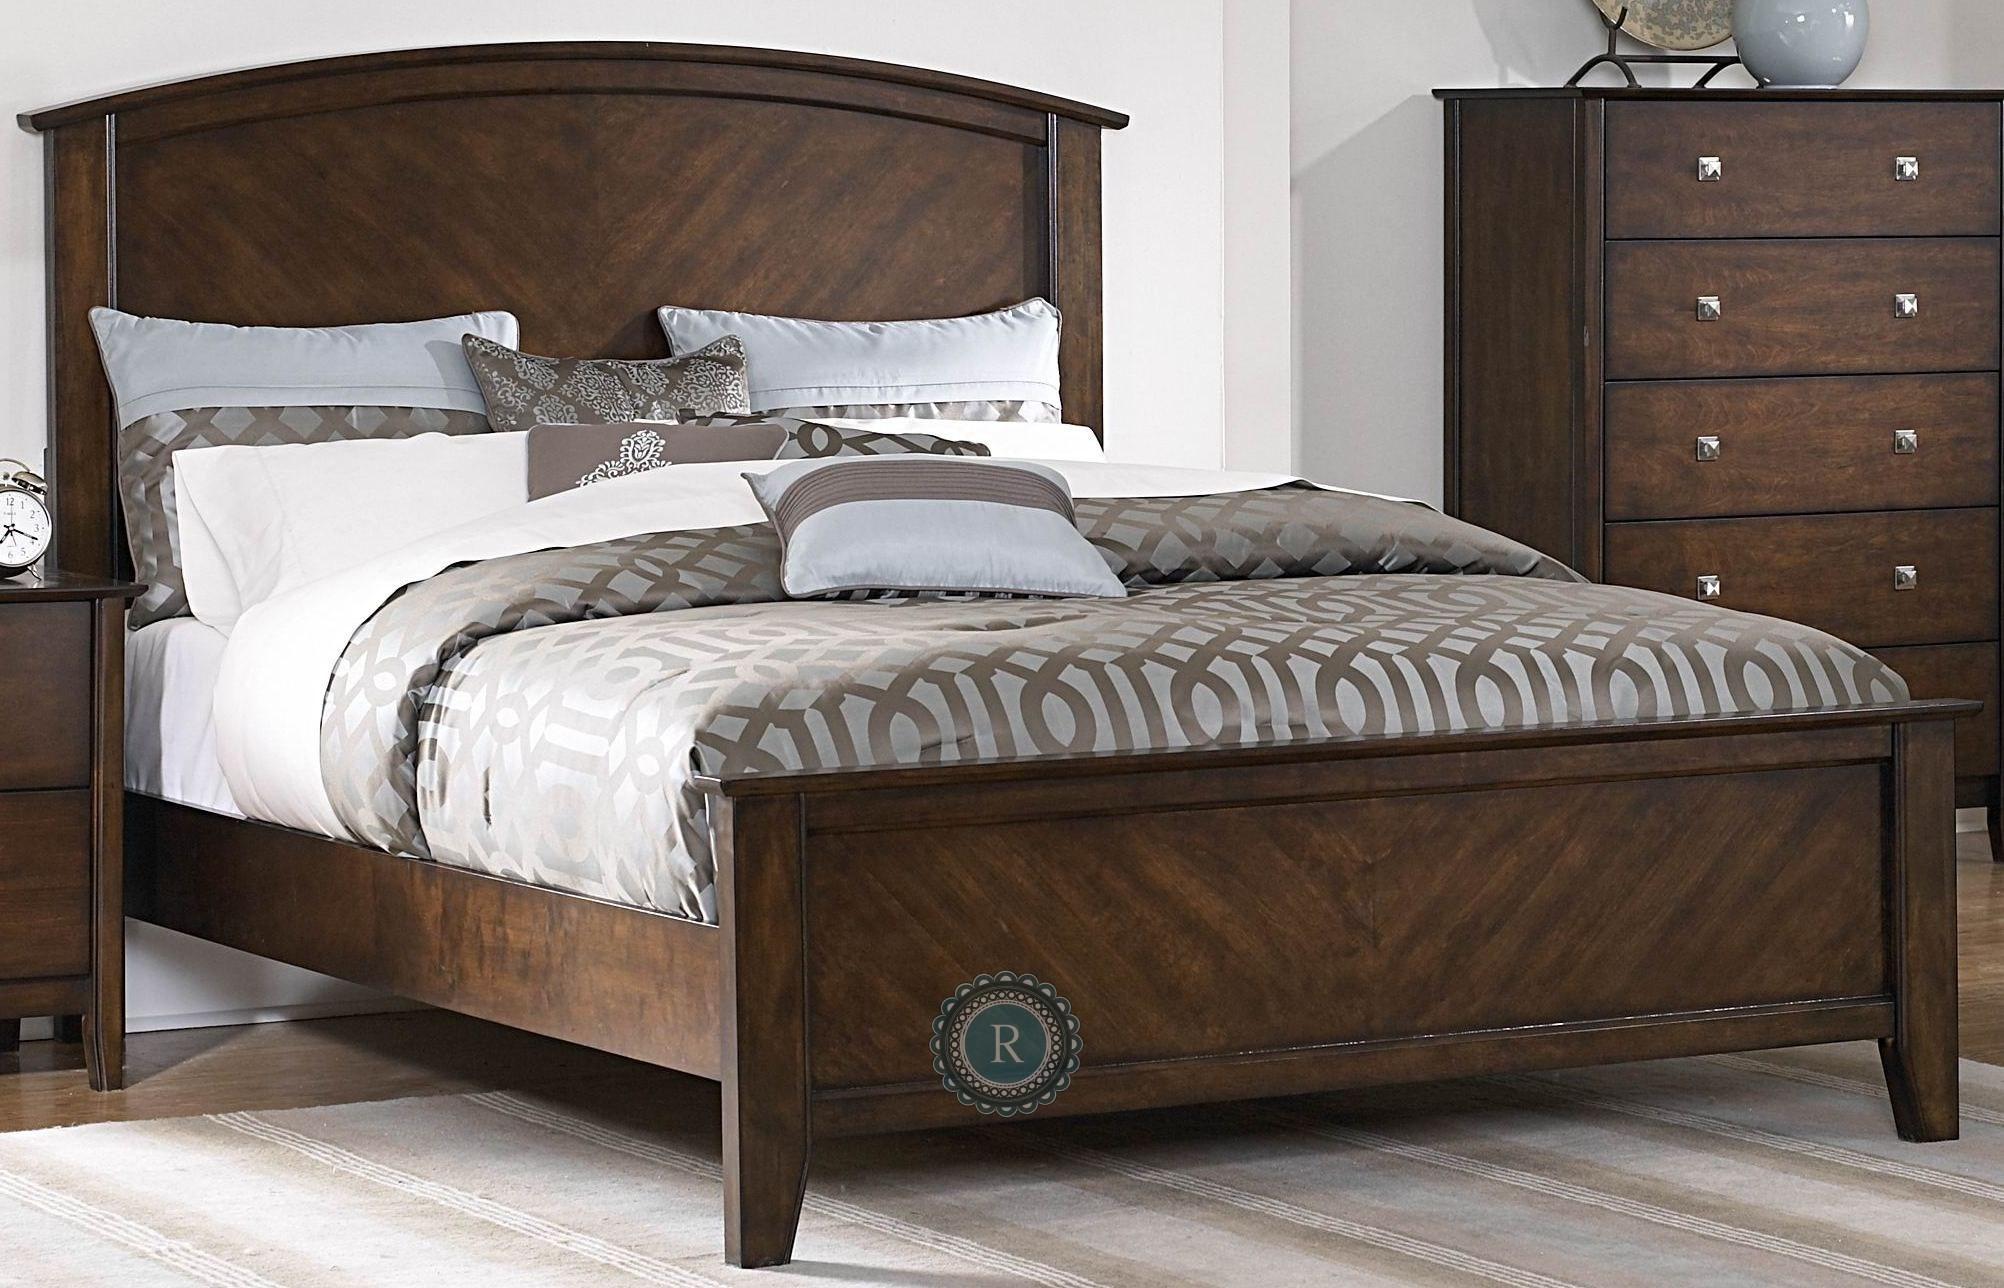 Cody Cal King Panel Bed From Homelegance 1732k 1ck